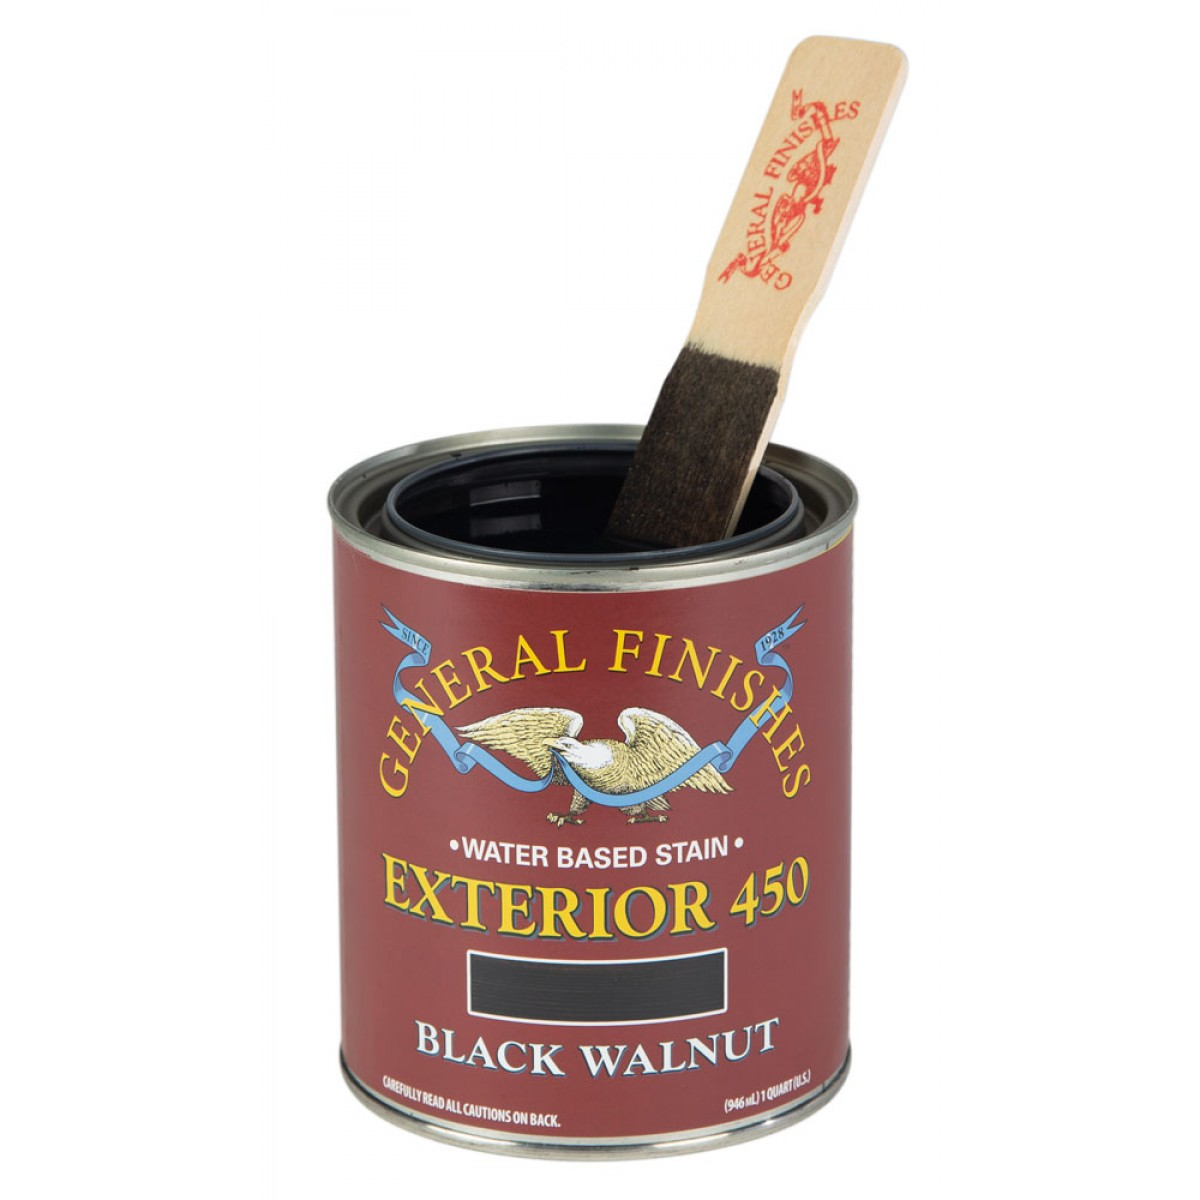 Exterior 450 Wood Stain Black Walnut 946ml